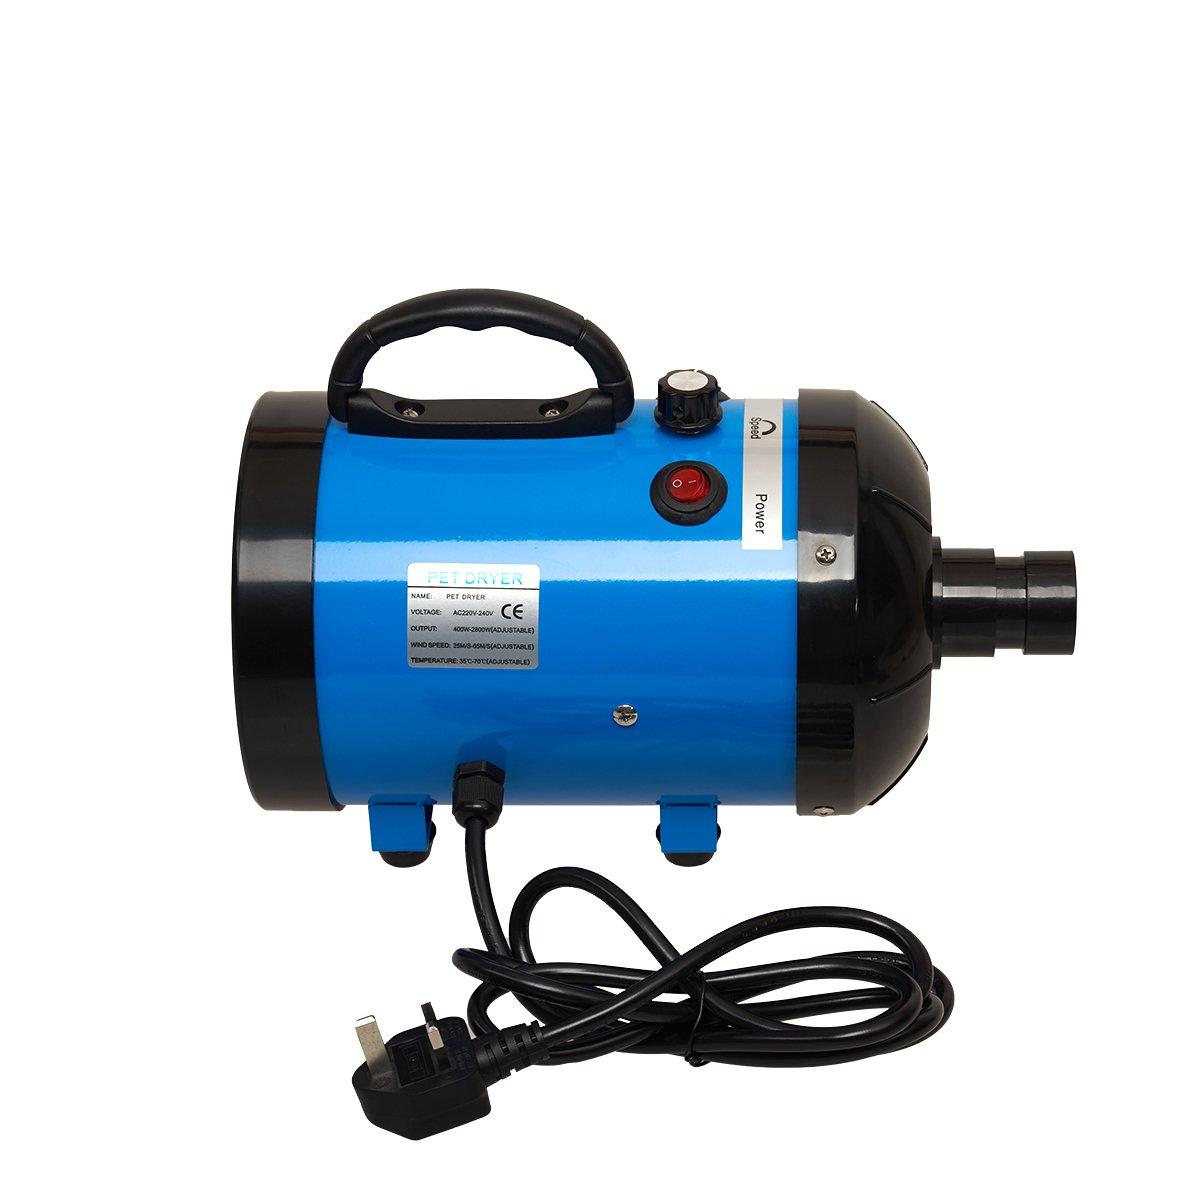 bluee Panana Low Noise 2800W Pet Dog Cat Grooming Hair Dryer Hairdryer Blaster Blower (Purple)